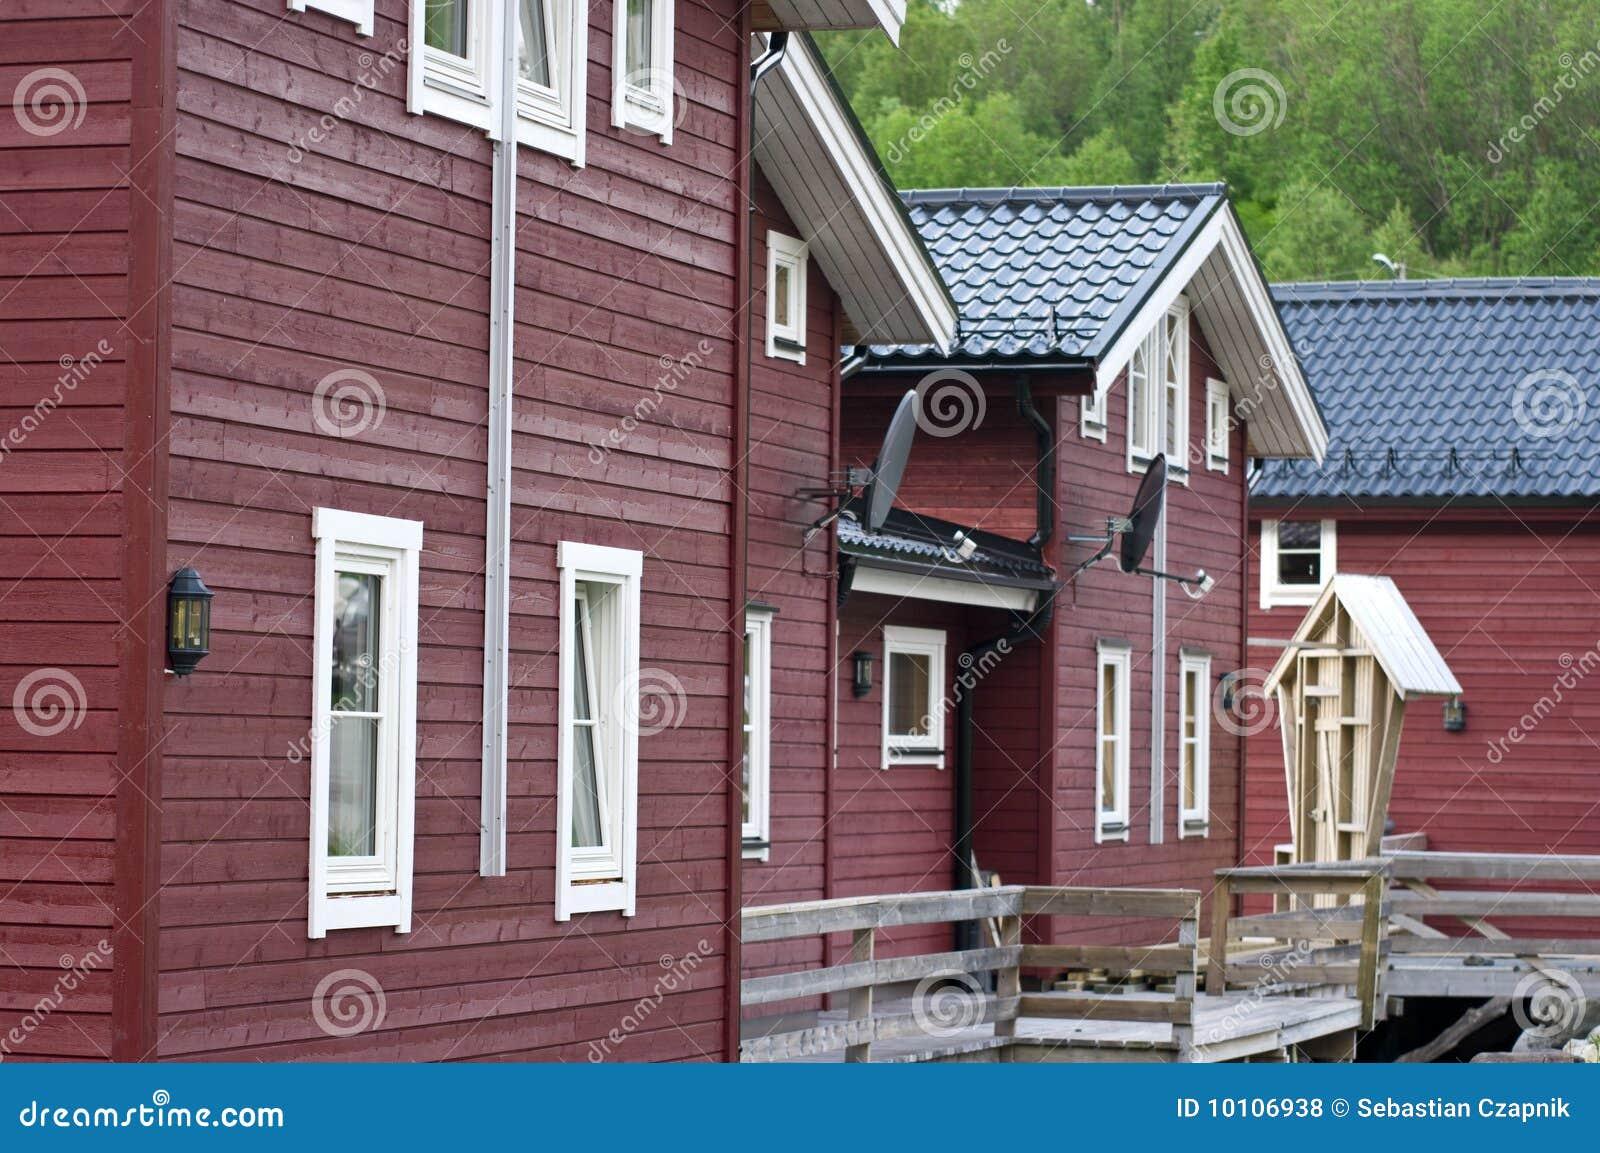 h lzerne norwegische h user lizenzfreie stockfotos bild 10106938. Black Bedroom Furniture Sets. Home Design Ideas